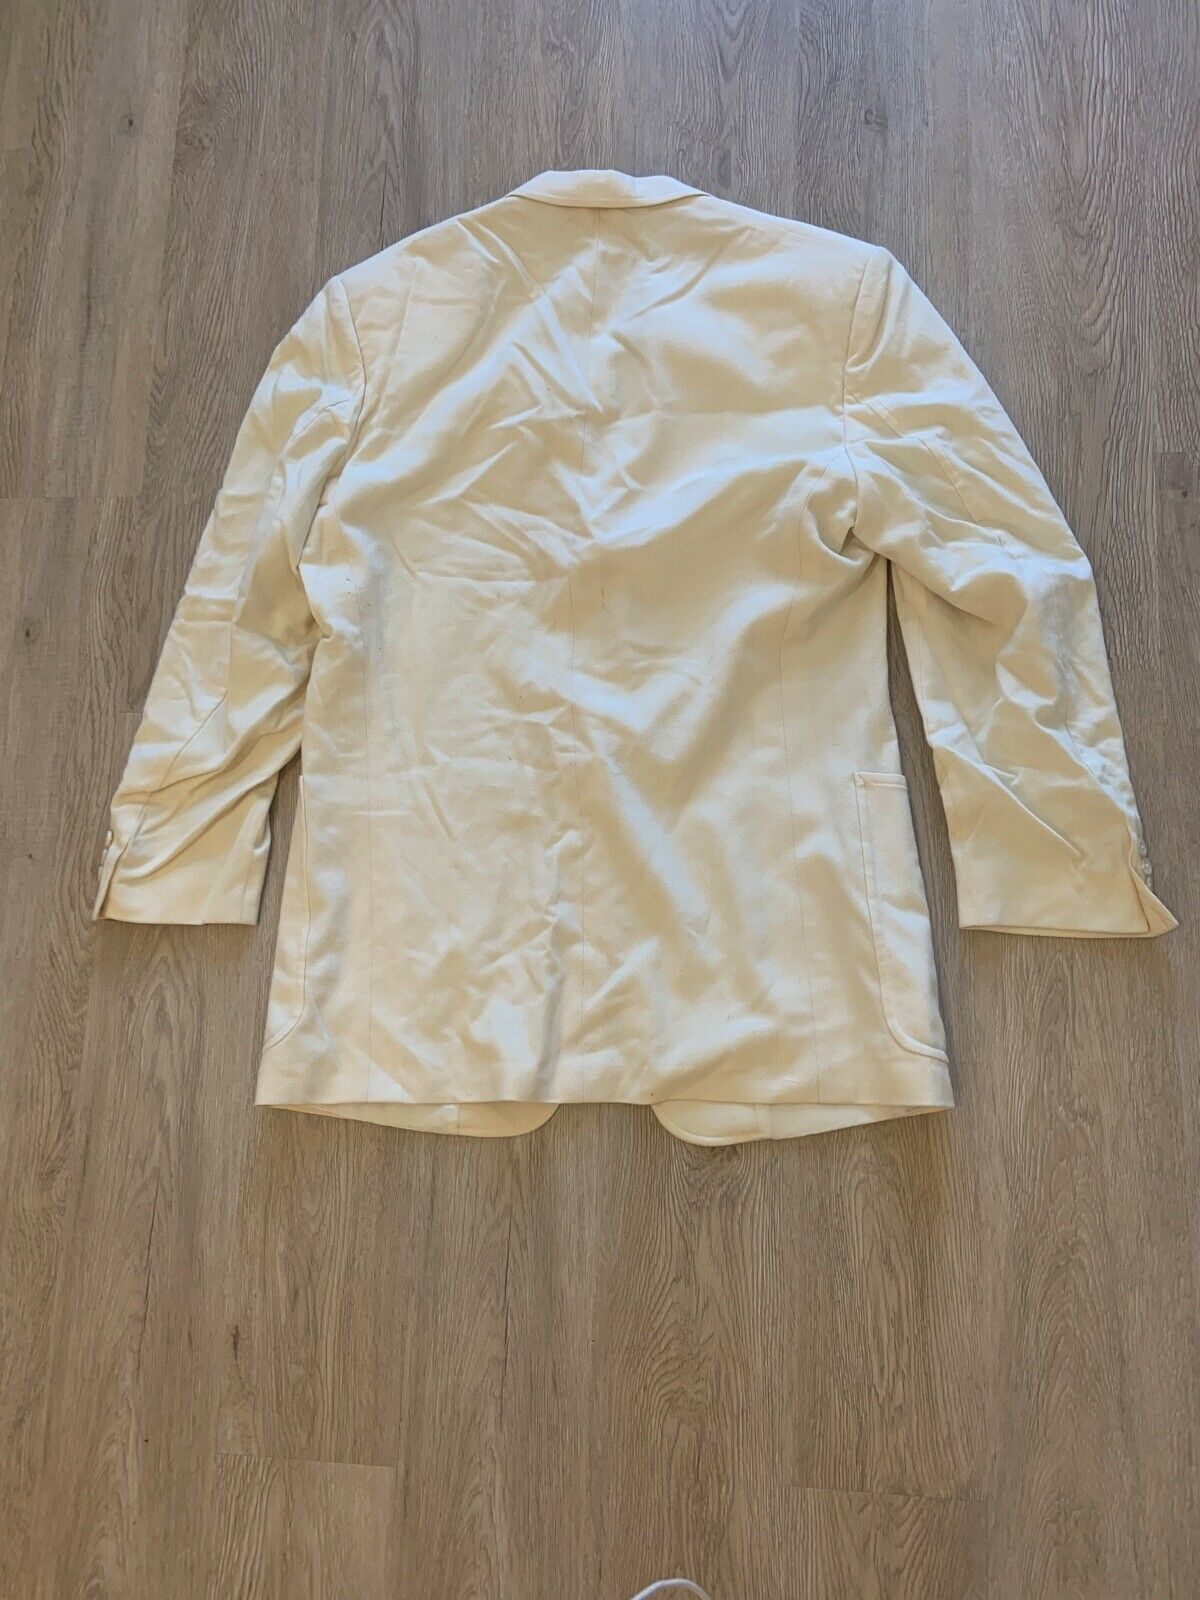 Vintage Polo Sport Sport Jacket - image 11